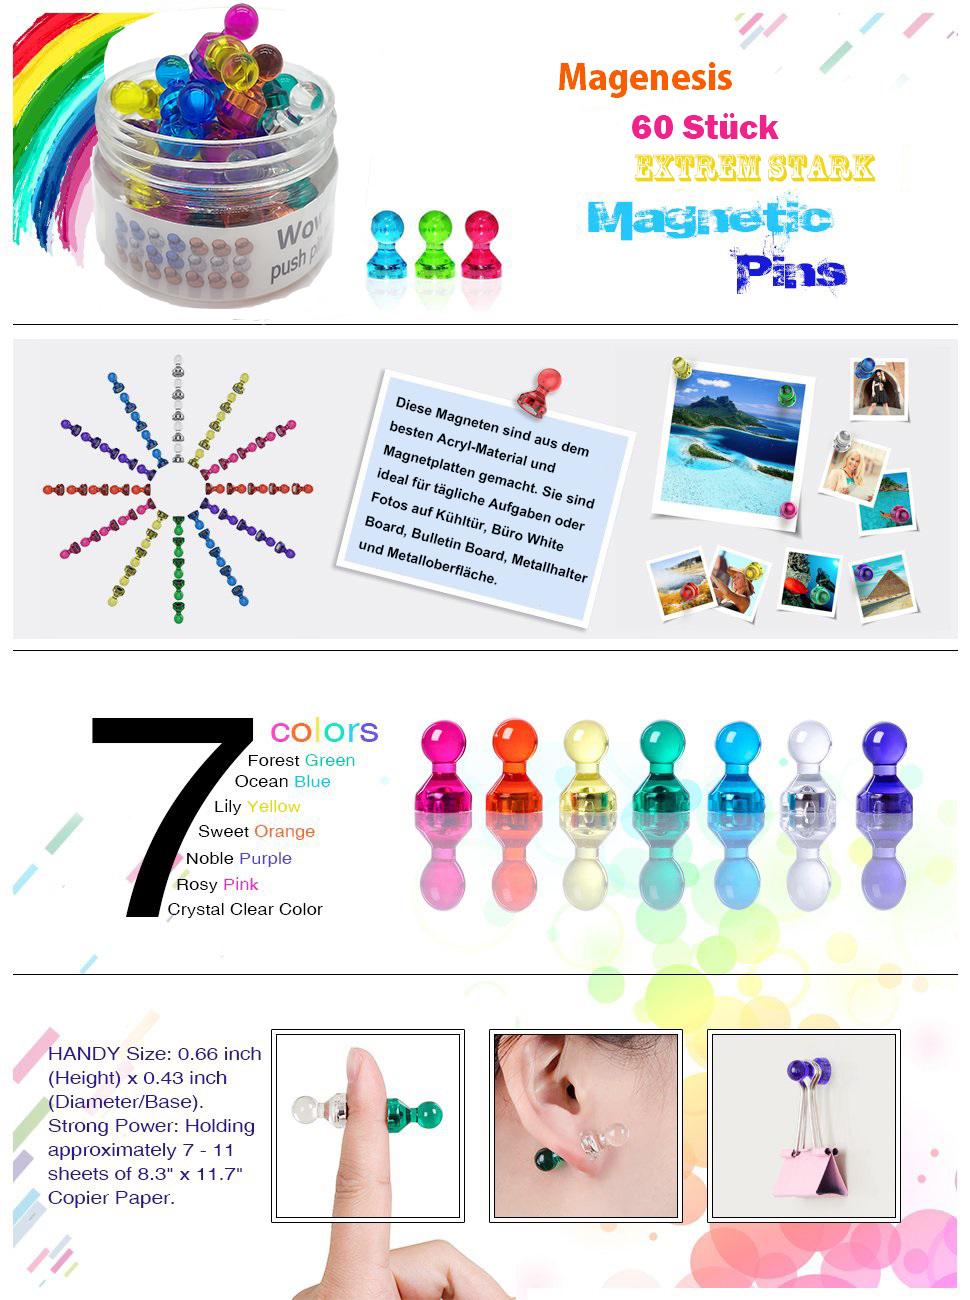 Magenesis 60 Stücke Farbige Bunte Transparente Whiteboard Magnete Tafelmagnete